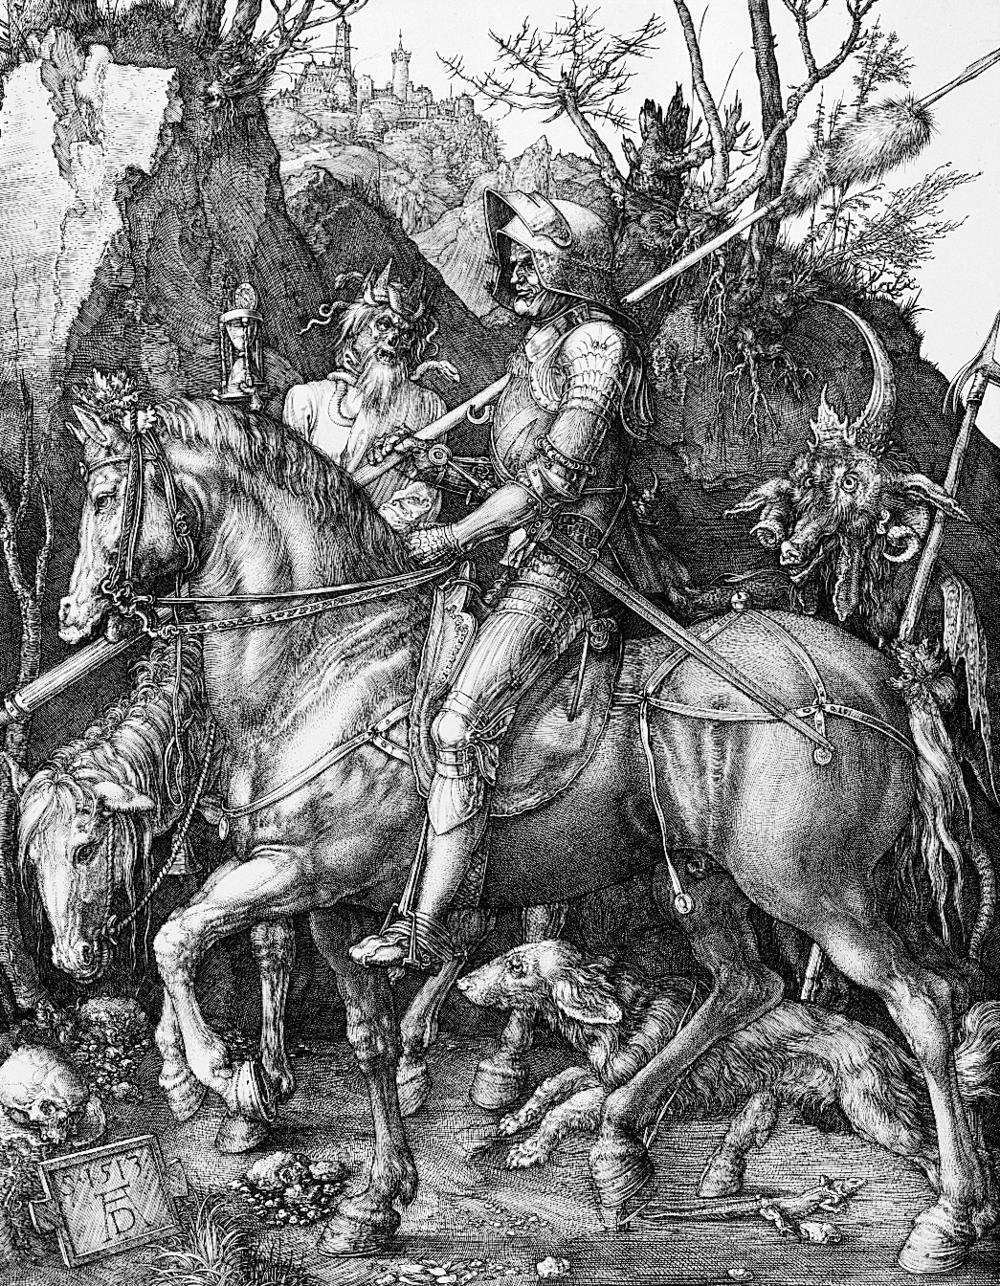 Ritter, Tod und Teufel (Knight, Death, and the Devil) Dürer